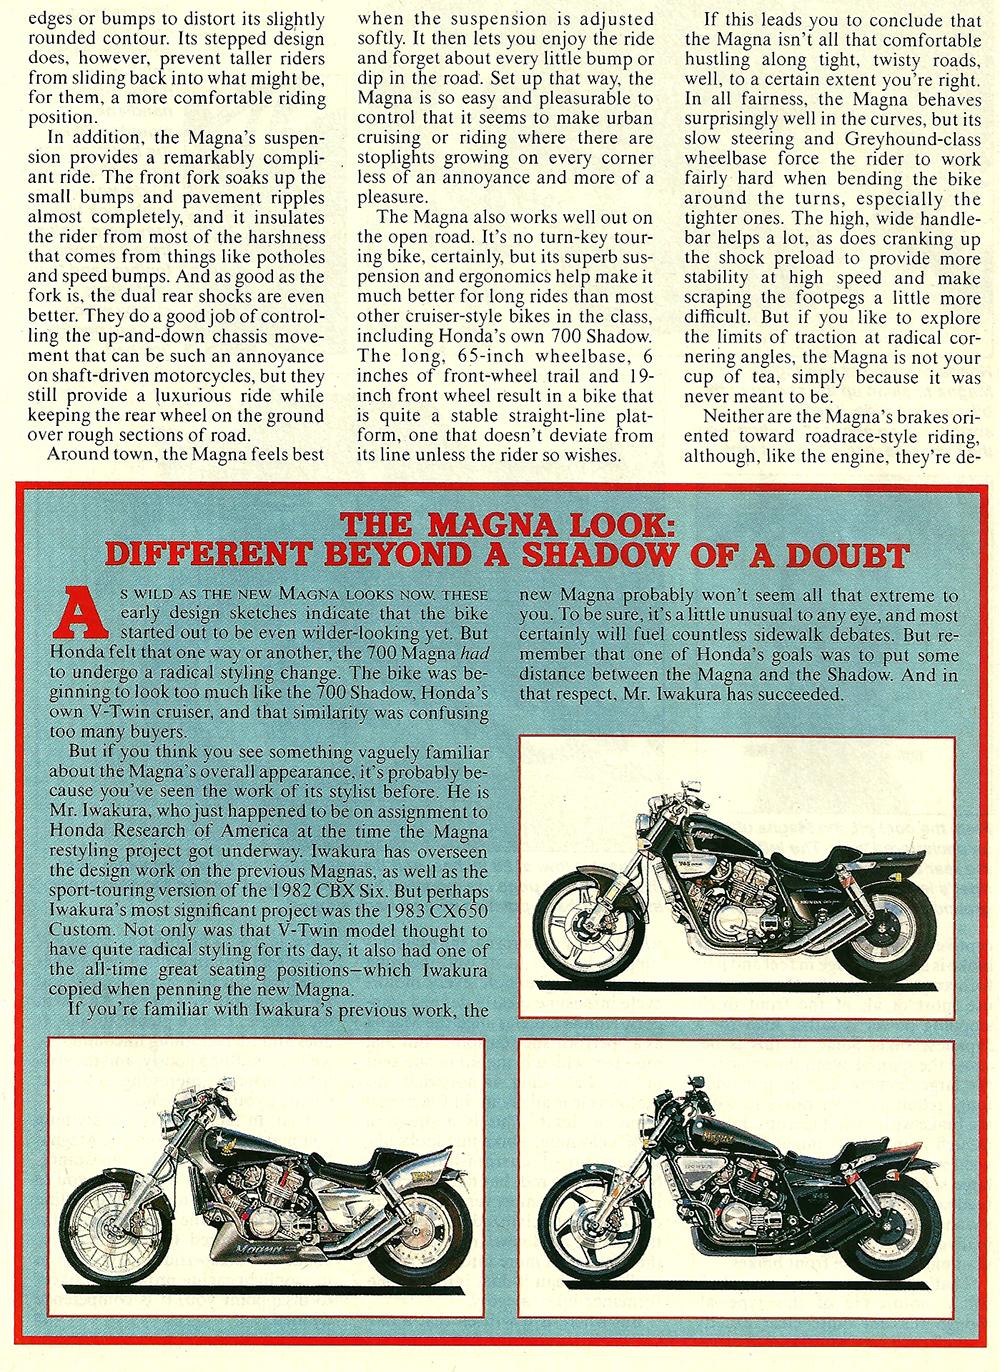 1987 Honda 700 Magna road test 04.jpg